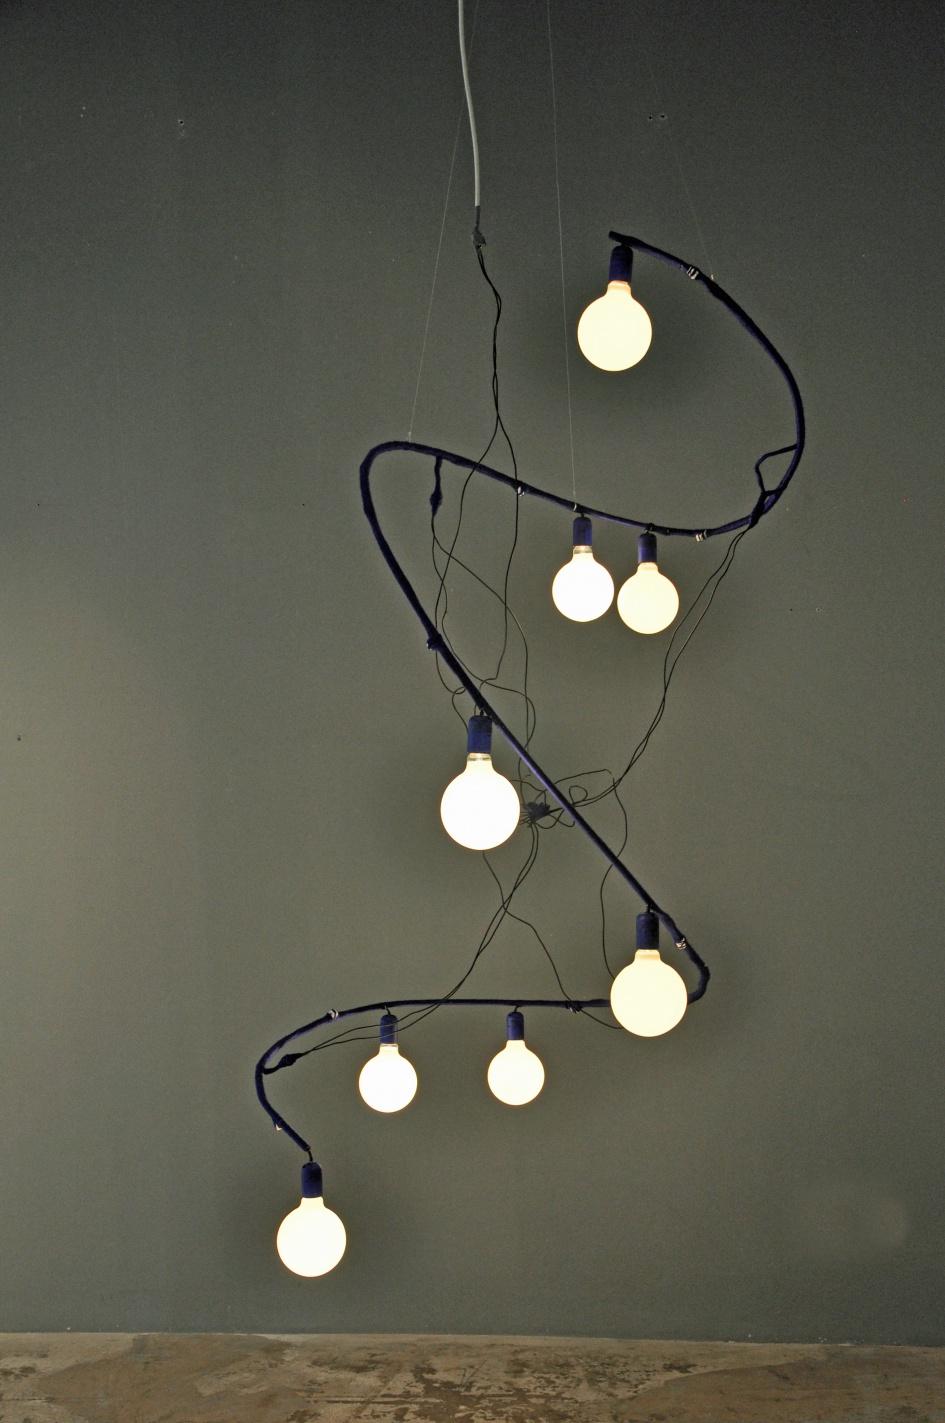 Gilbert Bretterbauer, Ligth Object